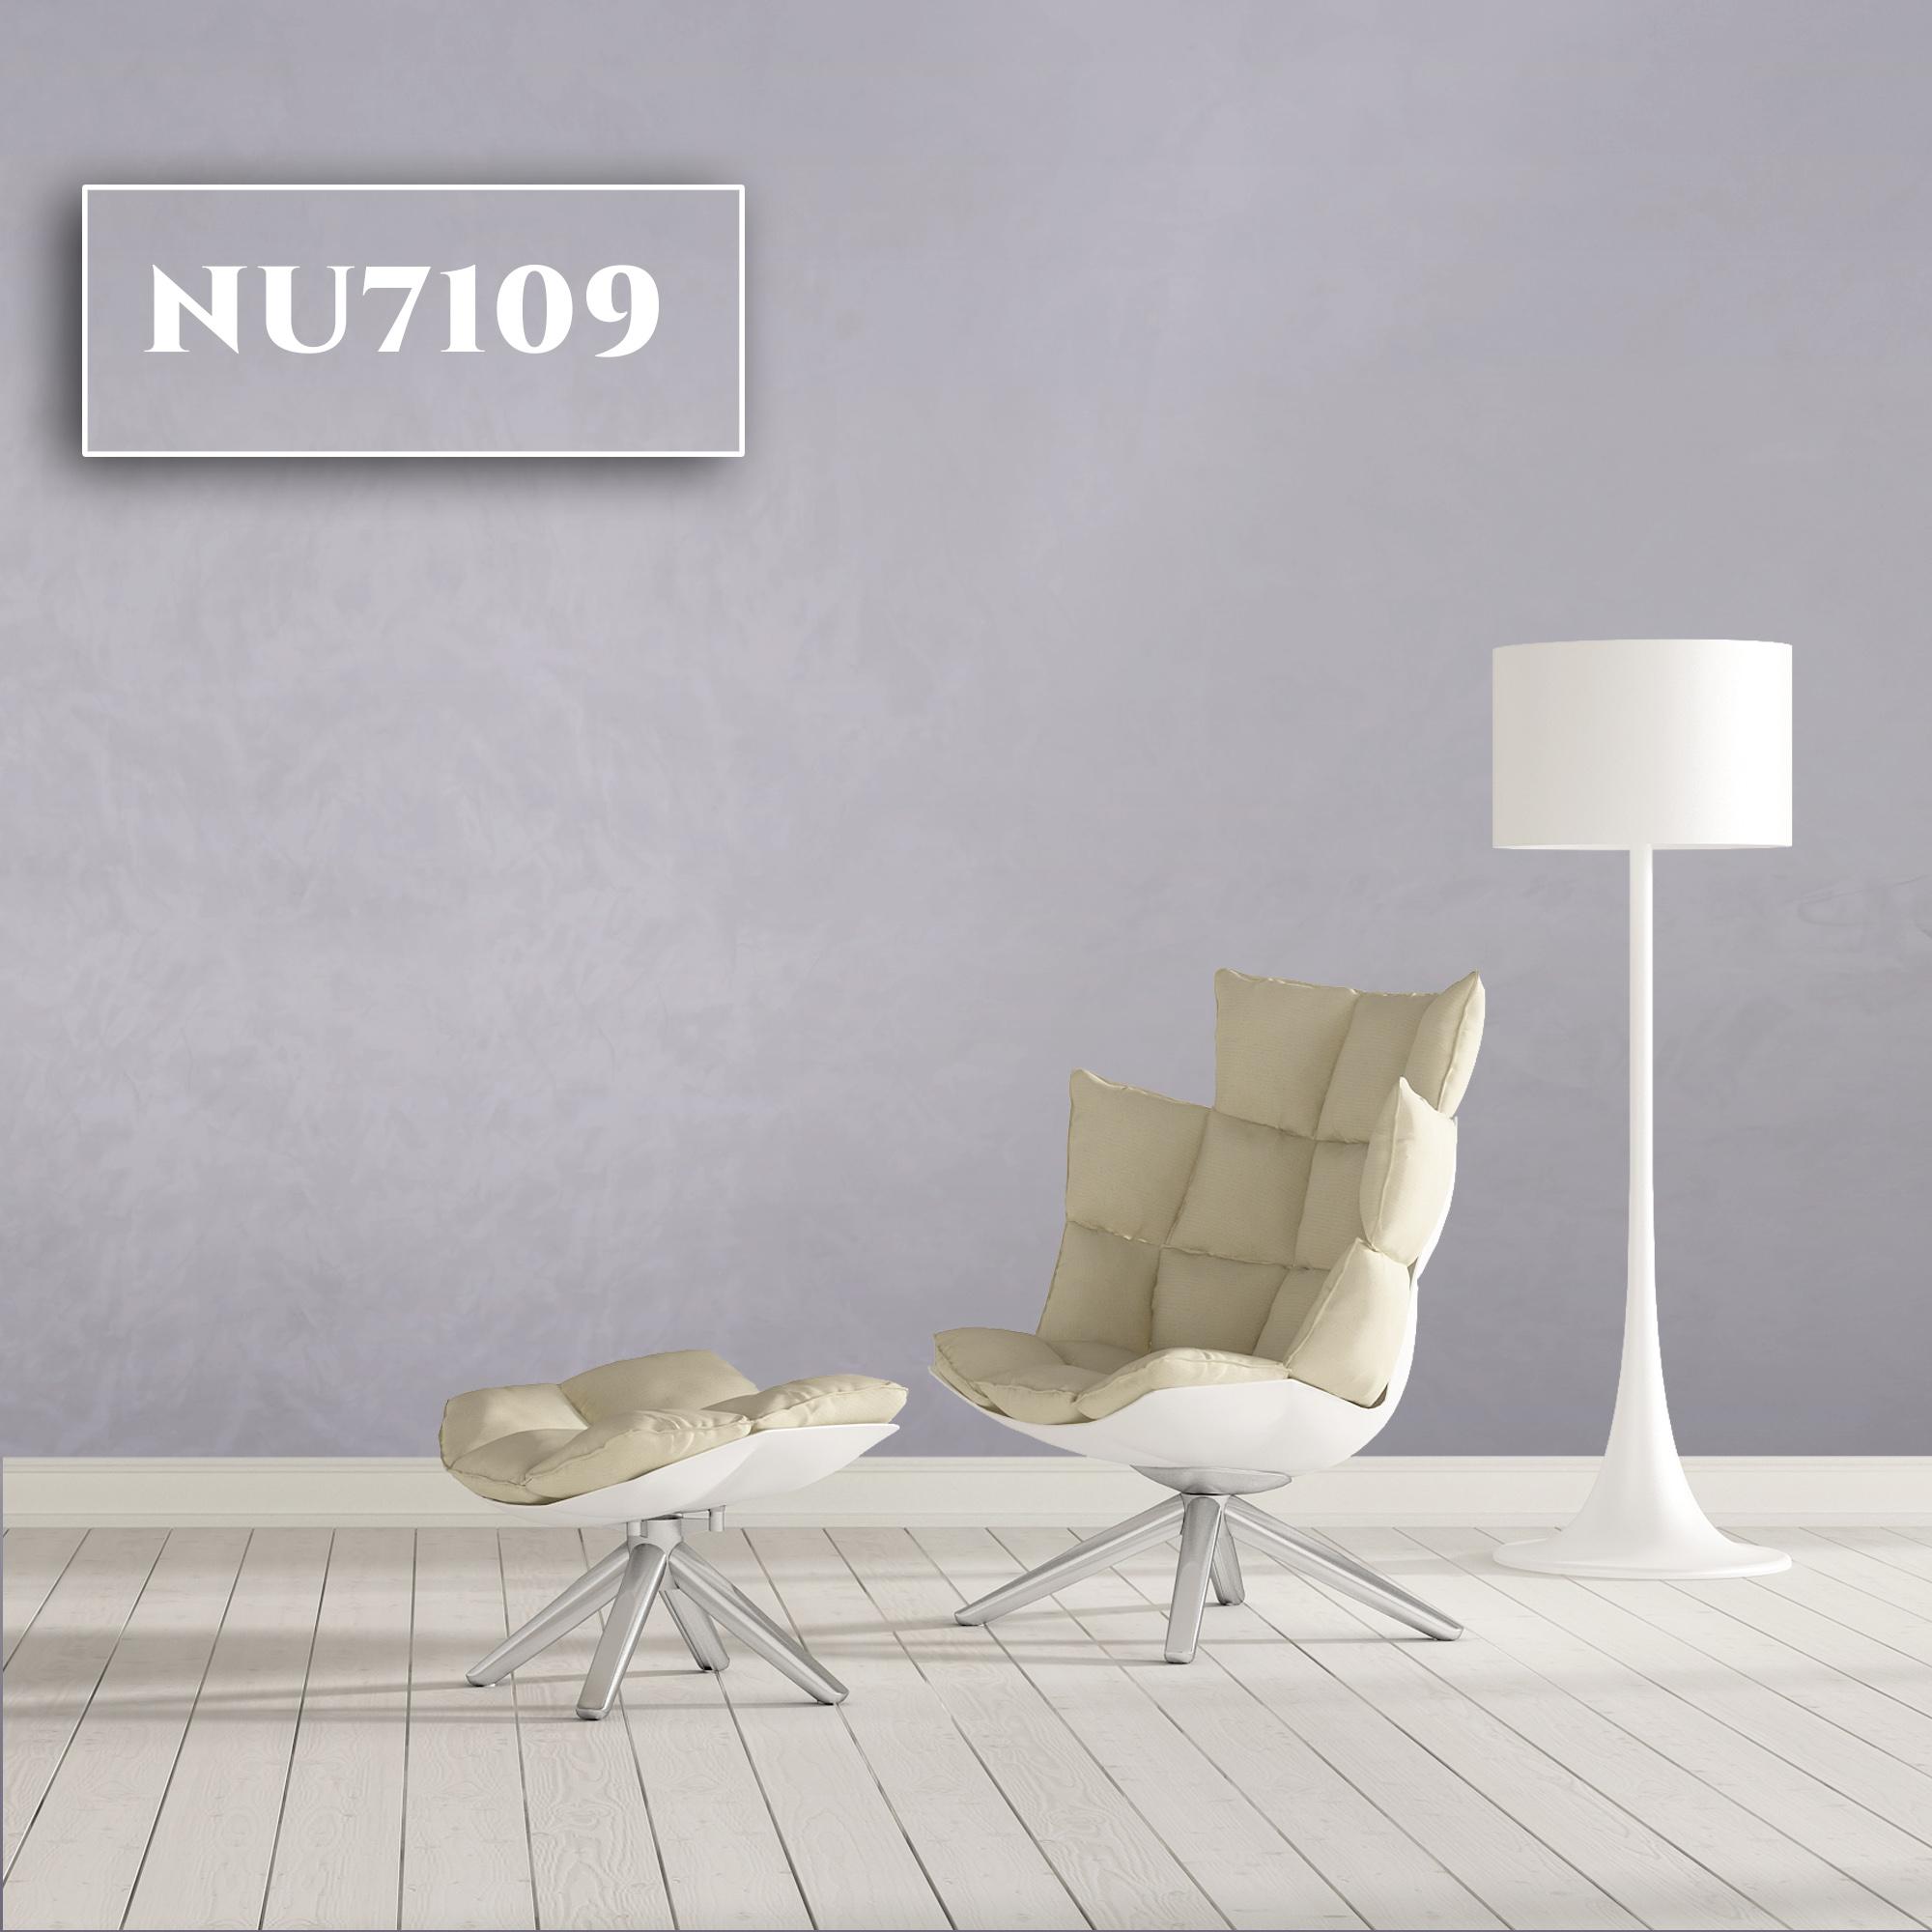 NU7109